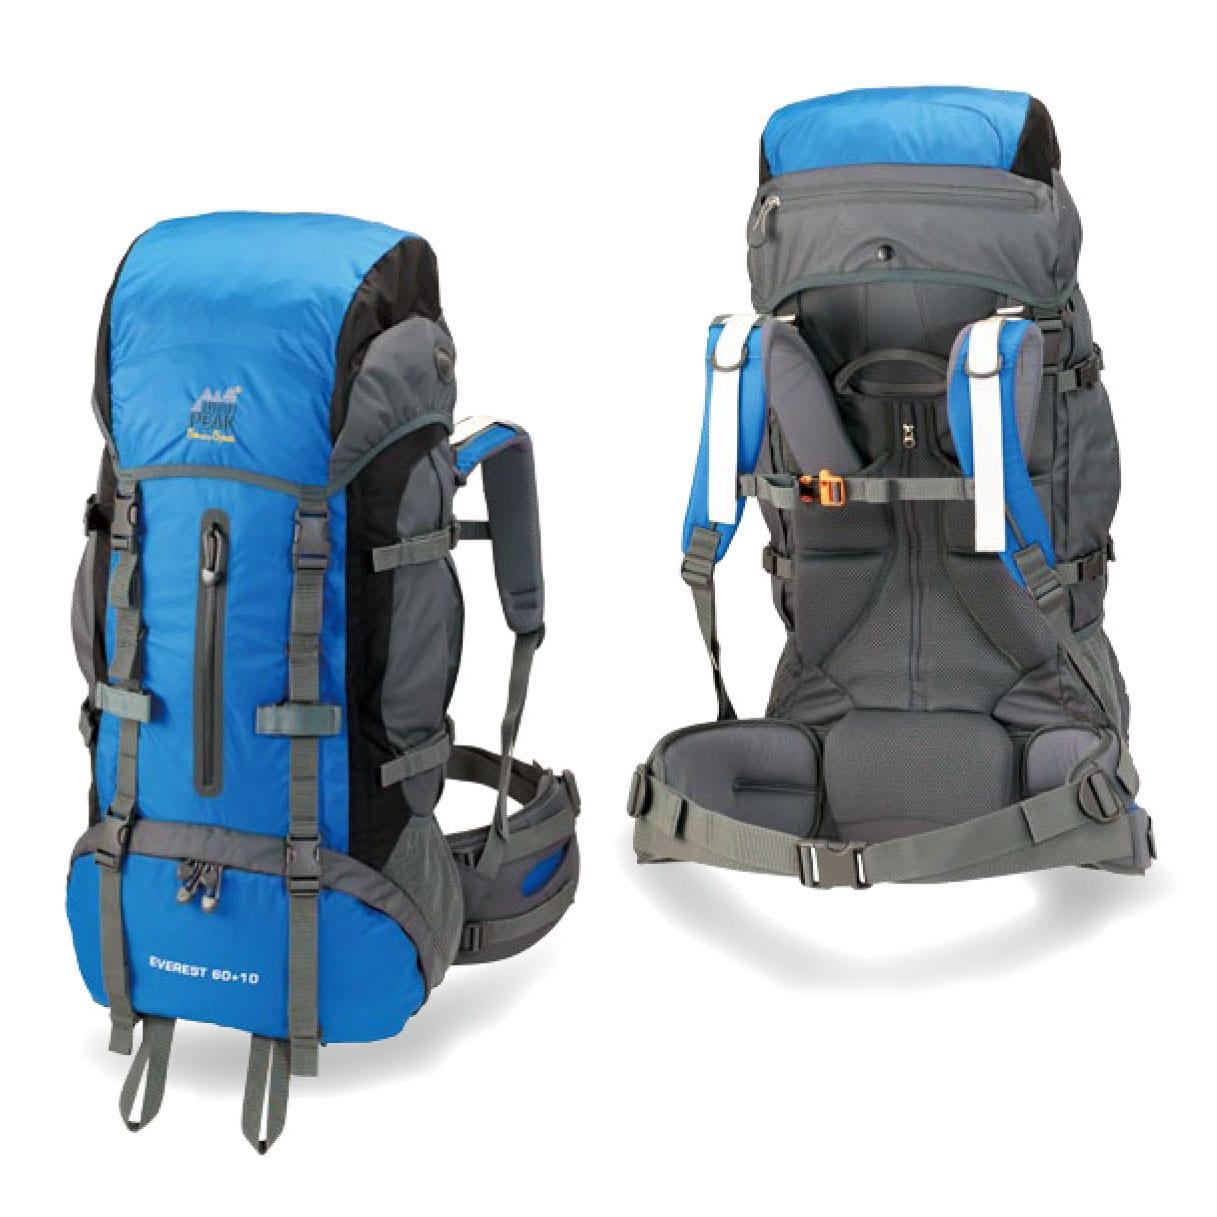 High Peak Everest 60 + 10 Internal Frame Backpack